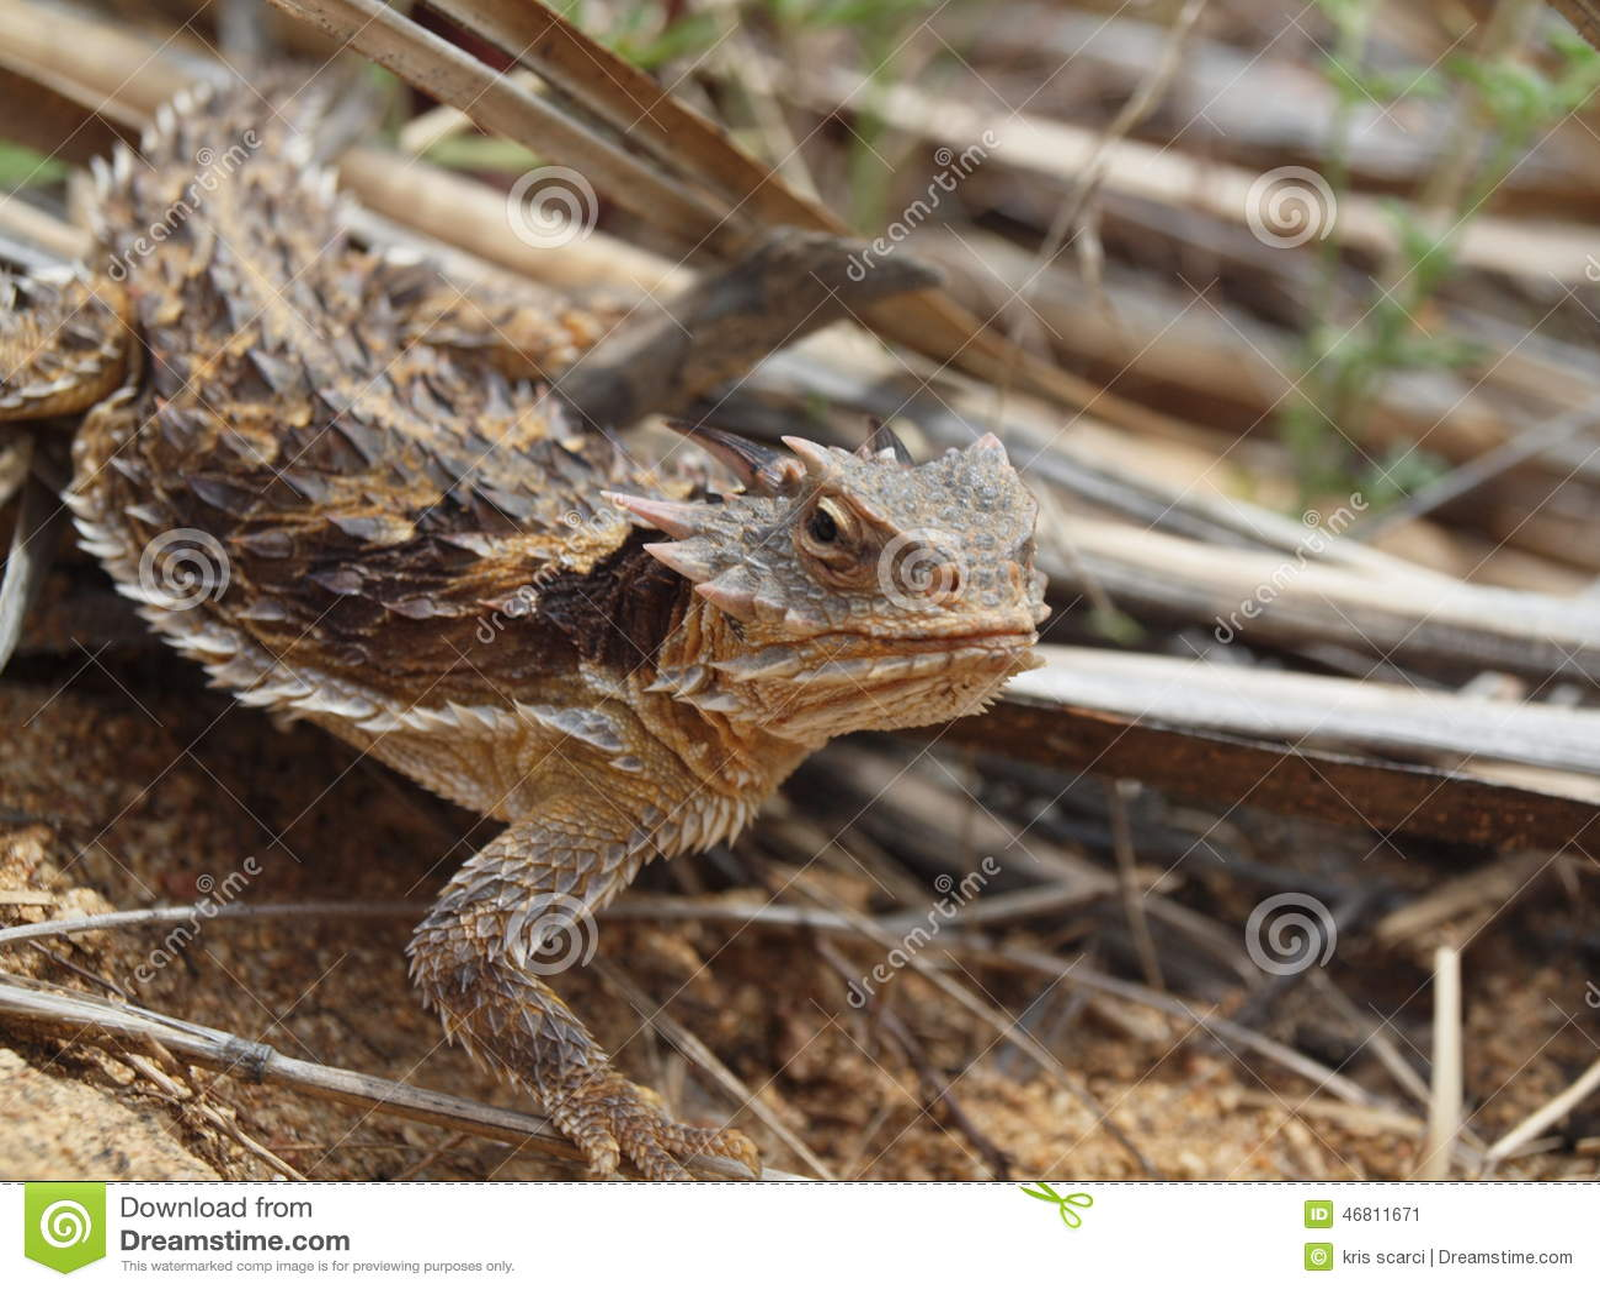 Southern Desert Horned Lizard